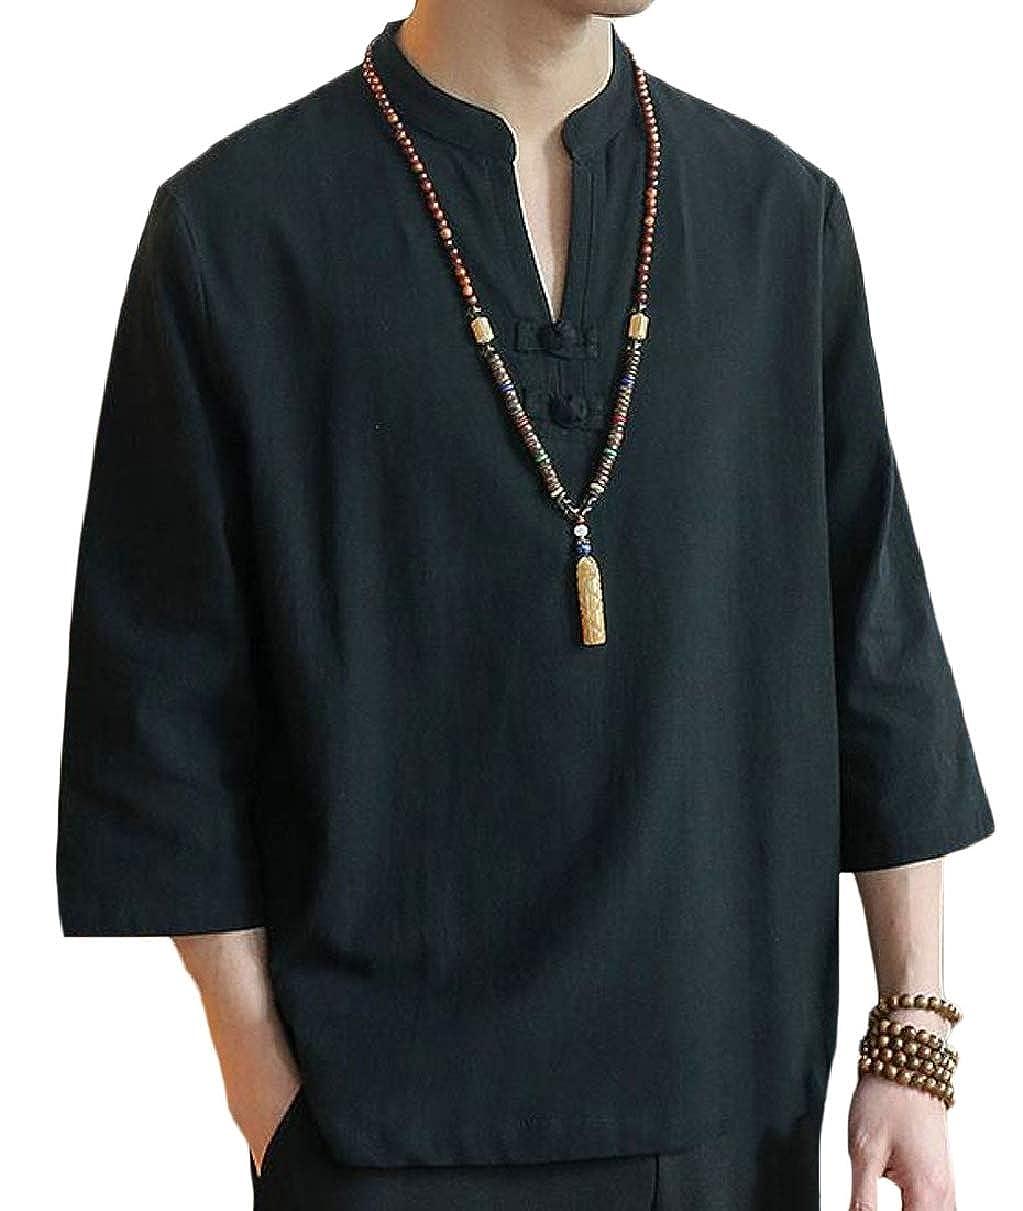 YIhujiuben Mens Chinese Embroidered Linen Shirt Retro V Neck Tees Shirt